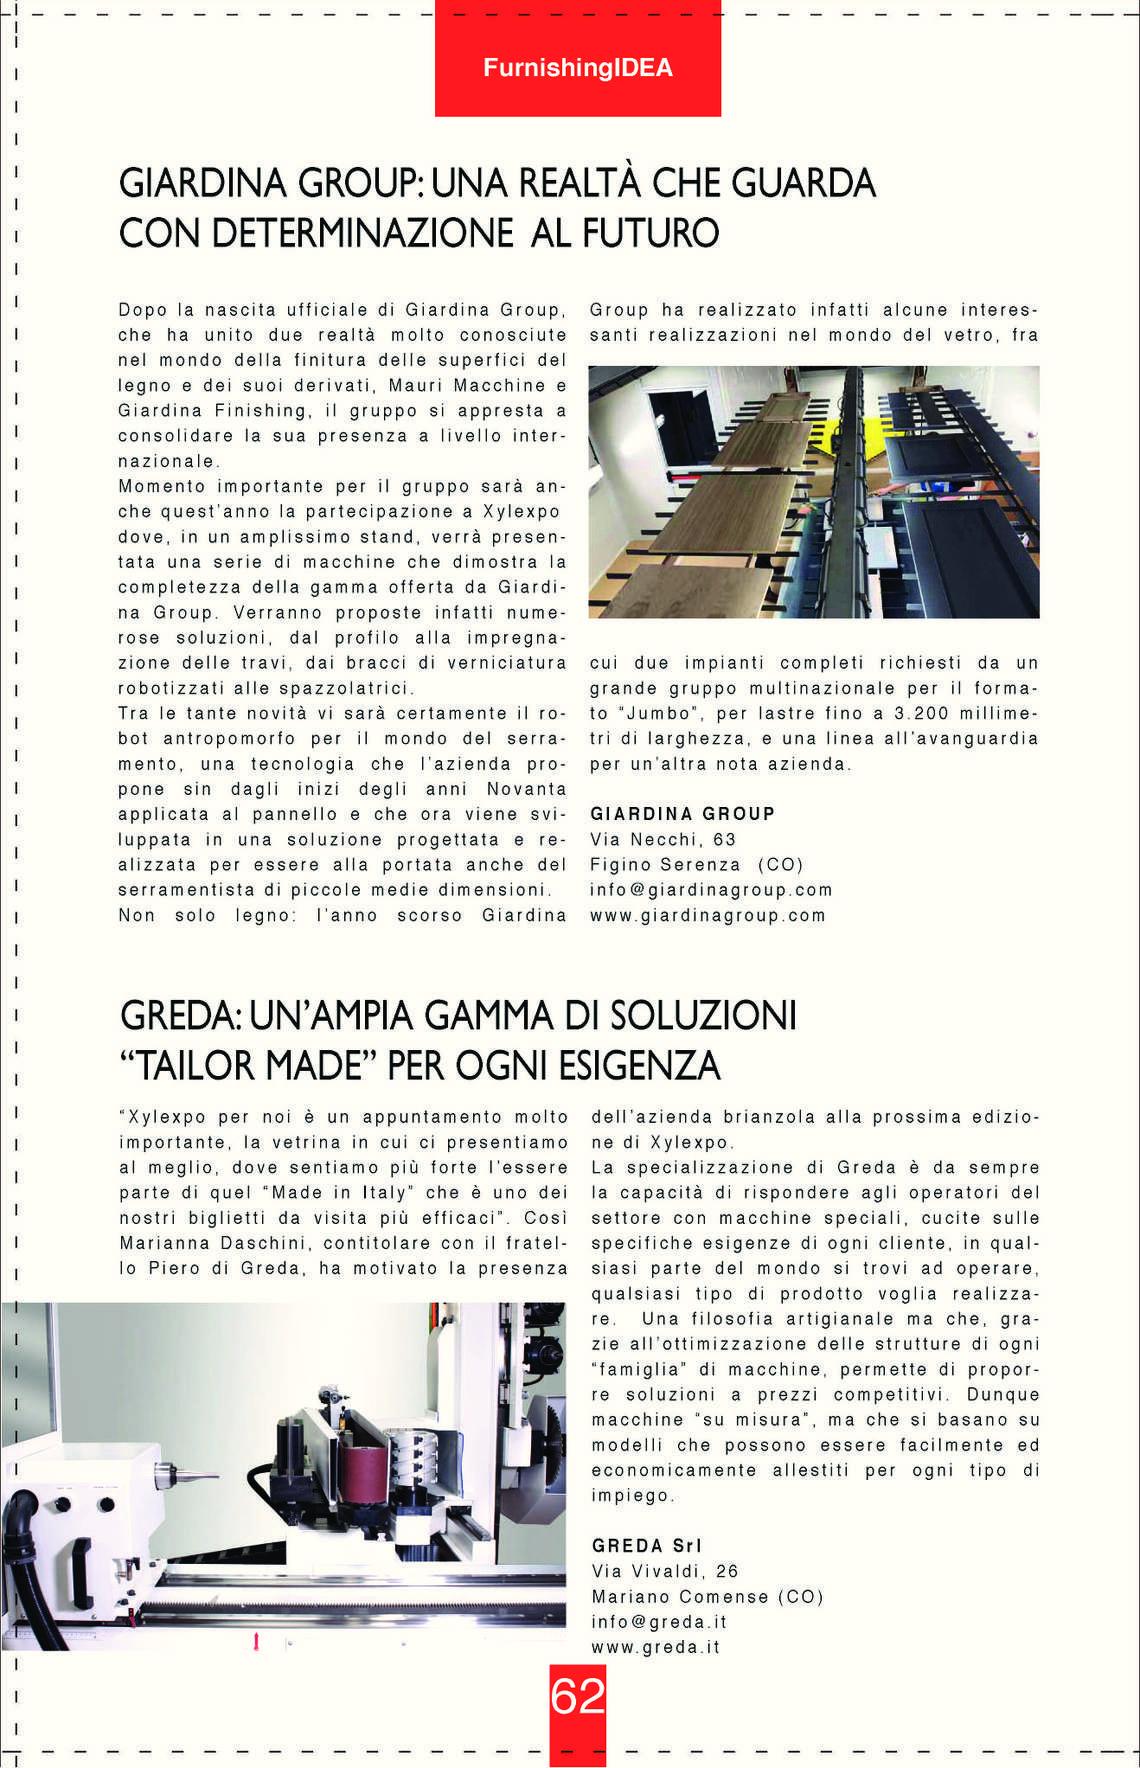 furnishing-idea-journal--1-2018_journal_9_061.jpg